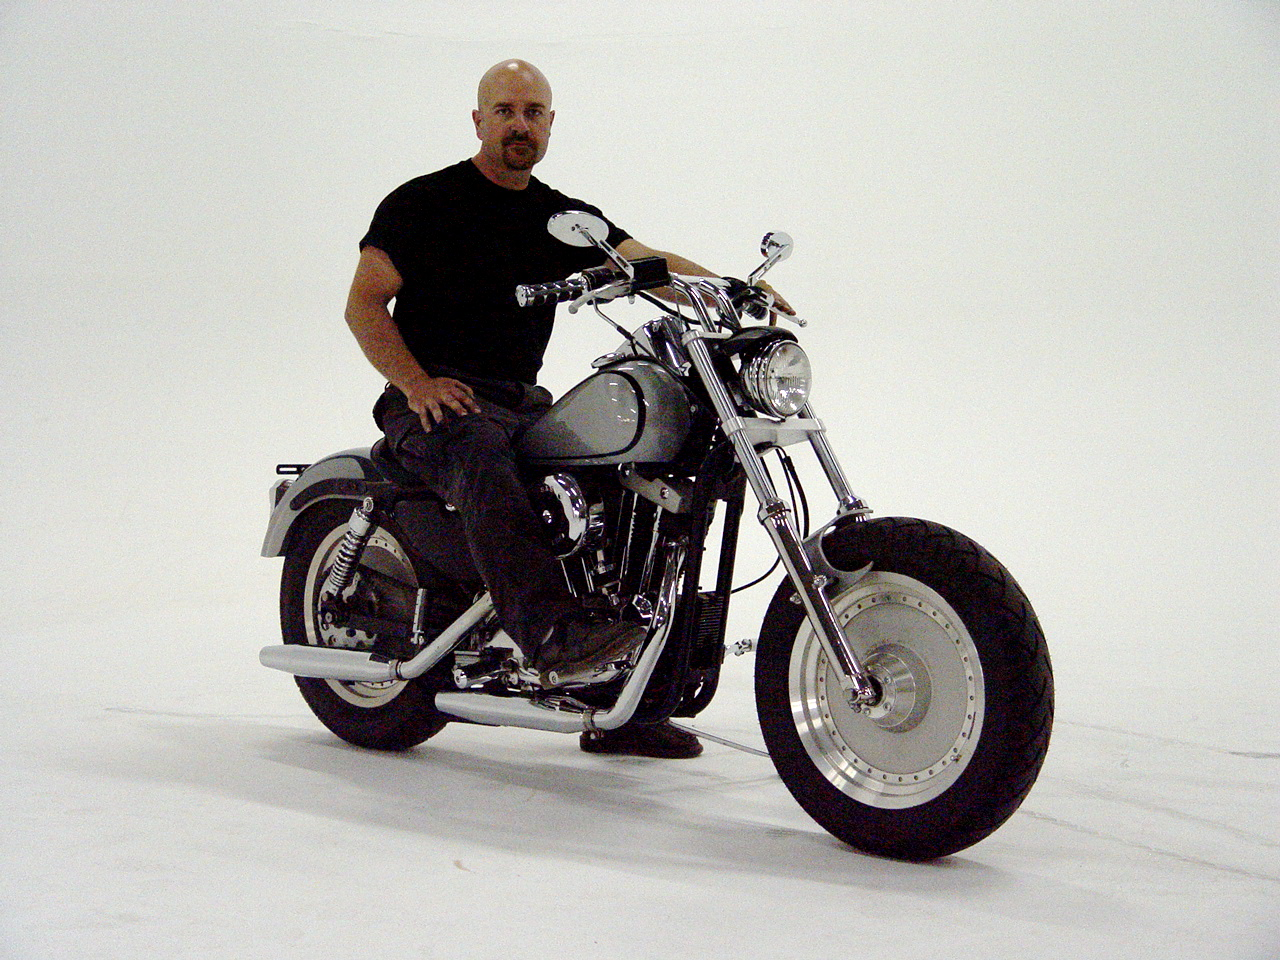 Studio rider reference shot